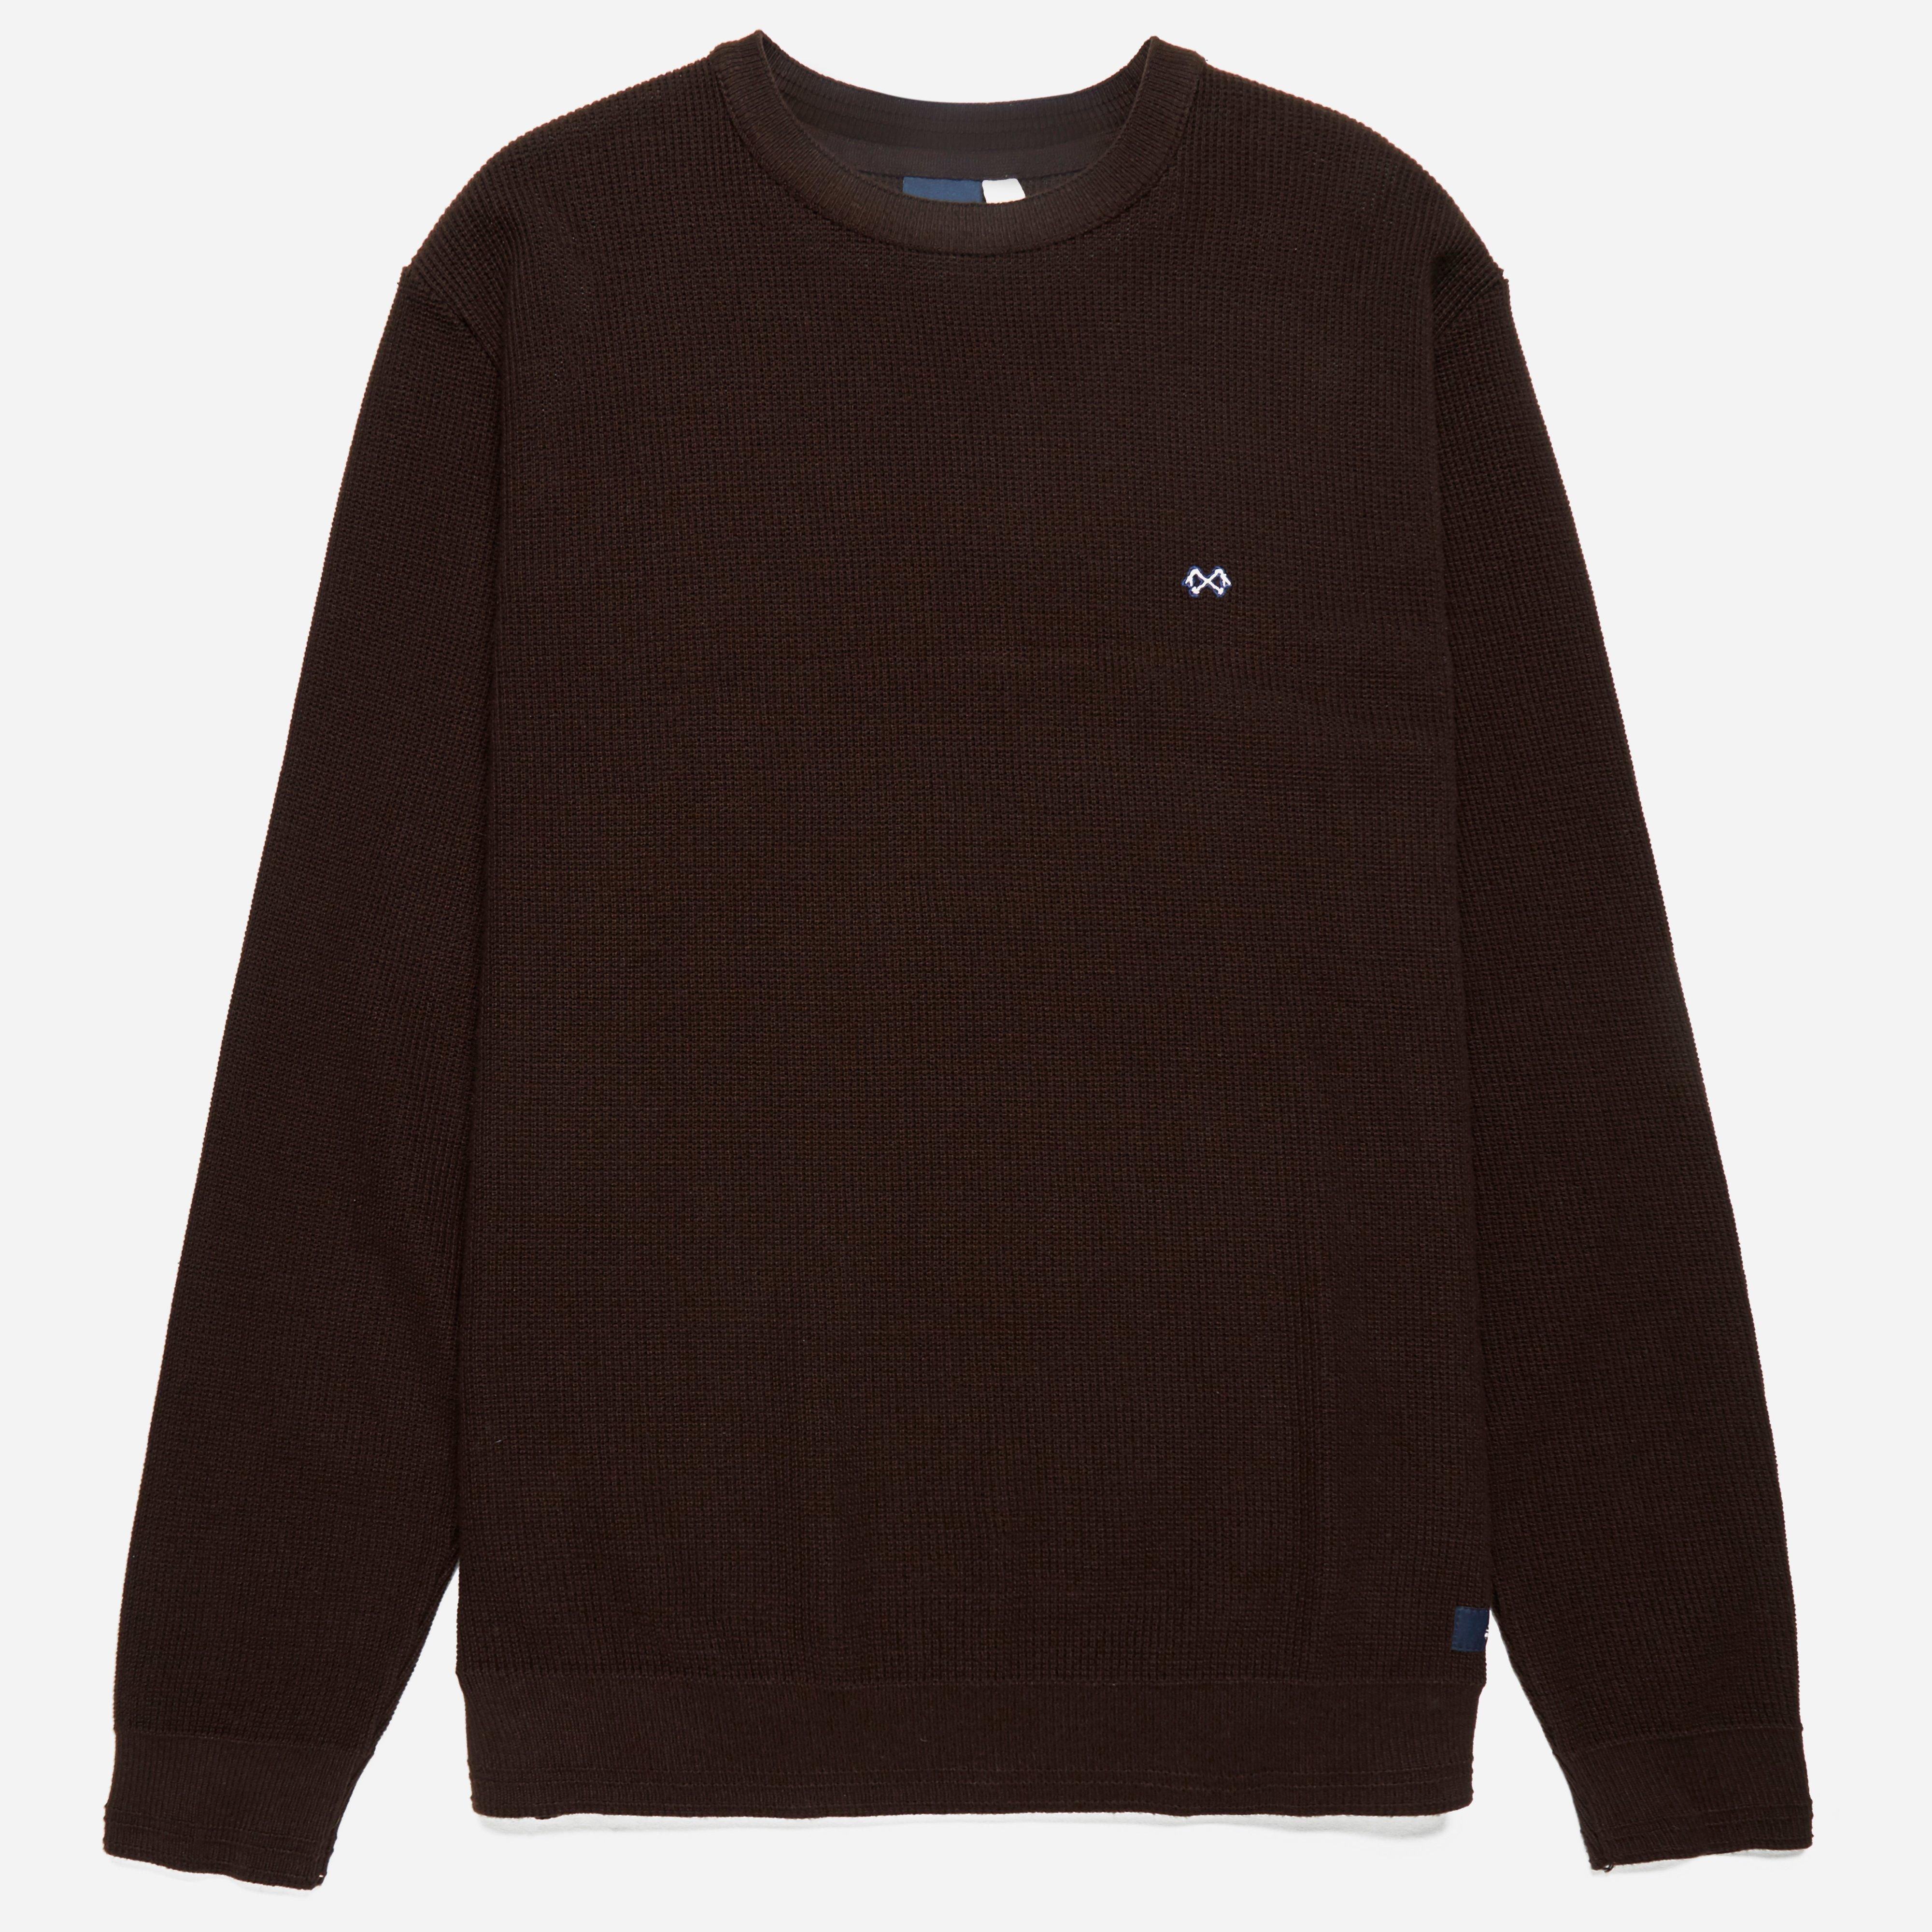 Bleu De Paname Tricot Sweater Dark Brown